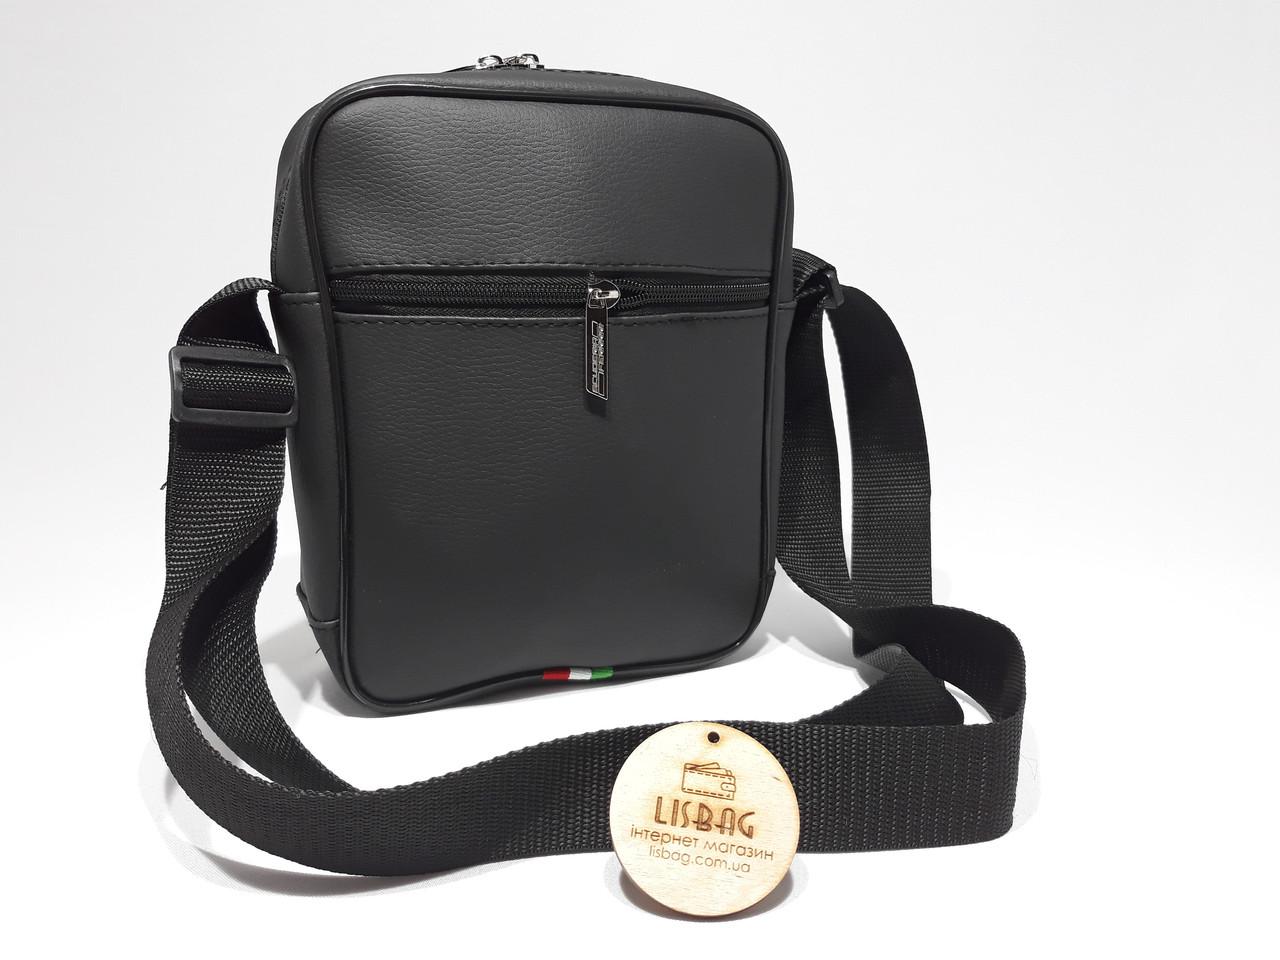 0982566ed25e ... фото Отличная сумка Puma ferrari на каждый день реплика люкс качества  2х компонентная кожа PU, ...